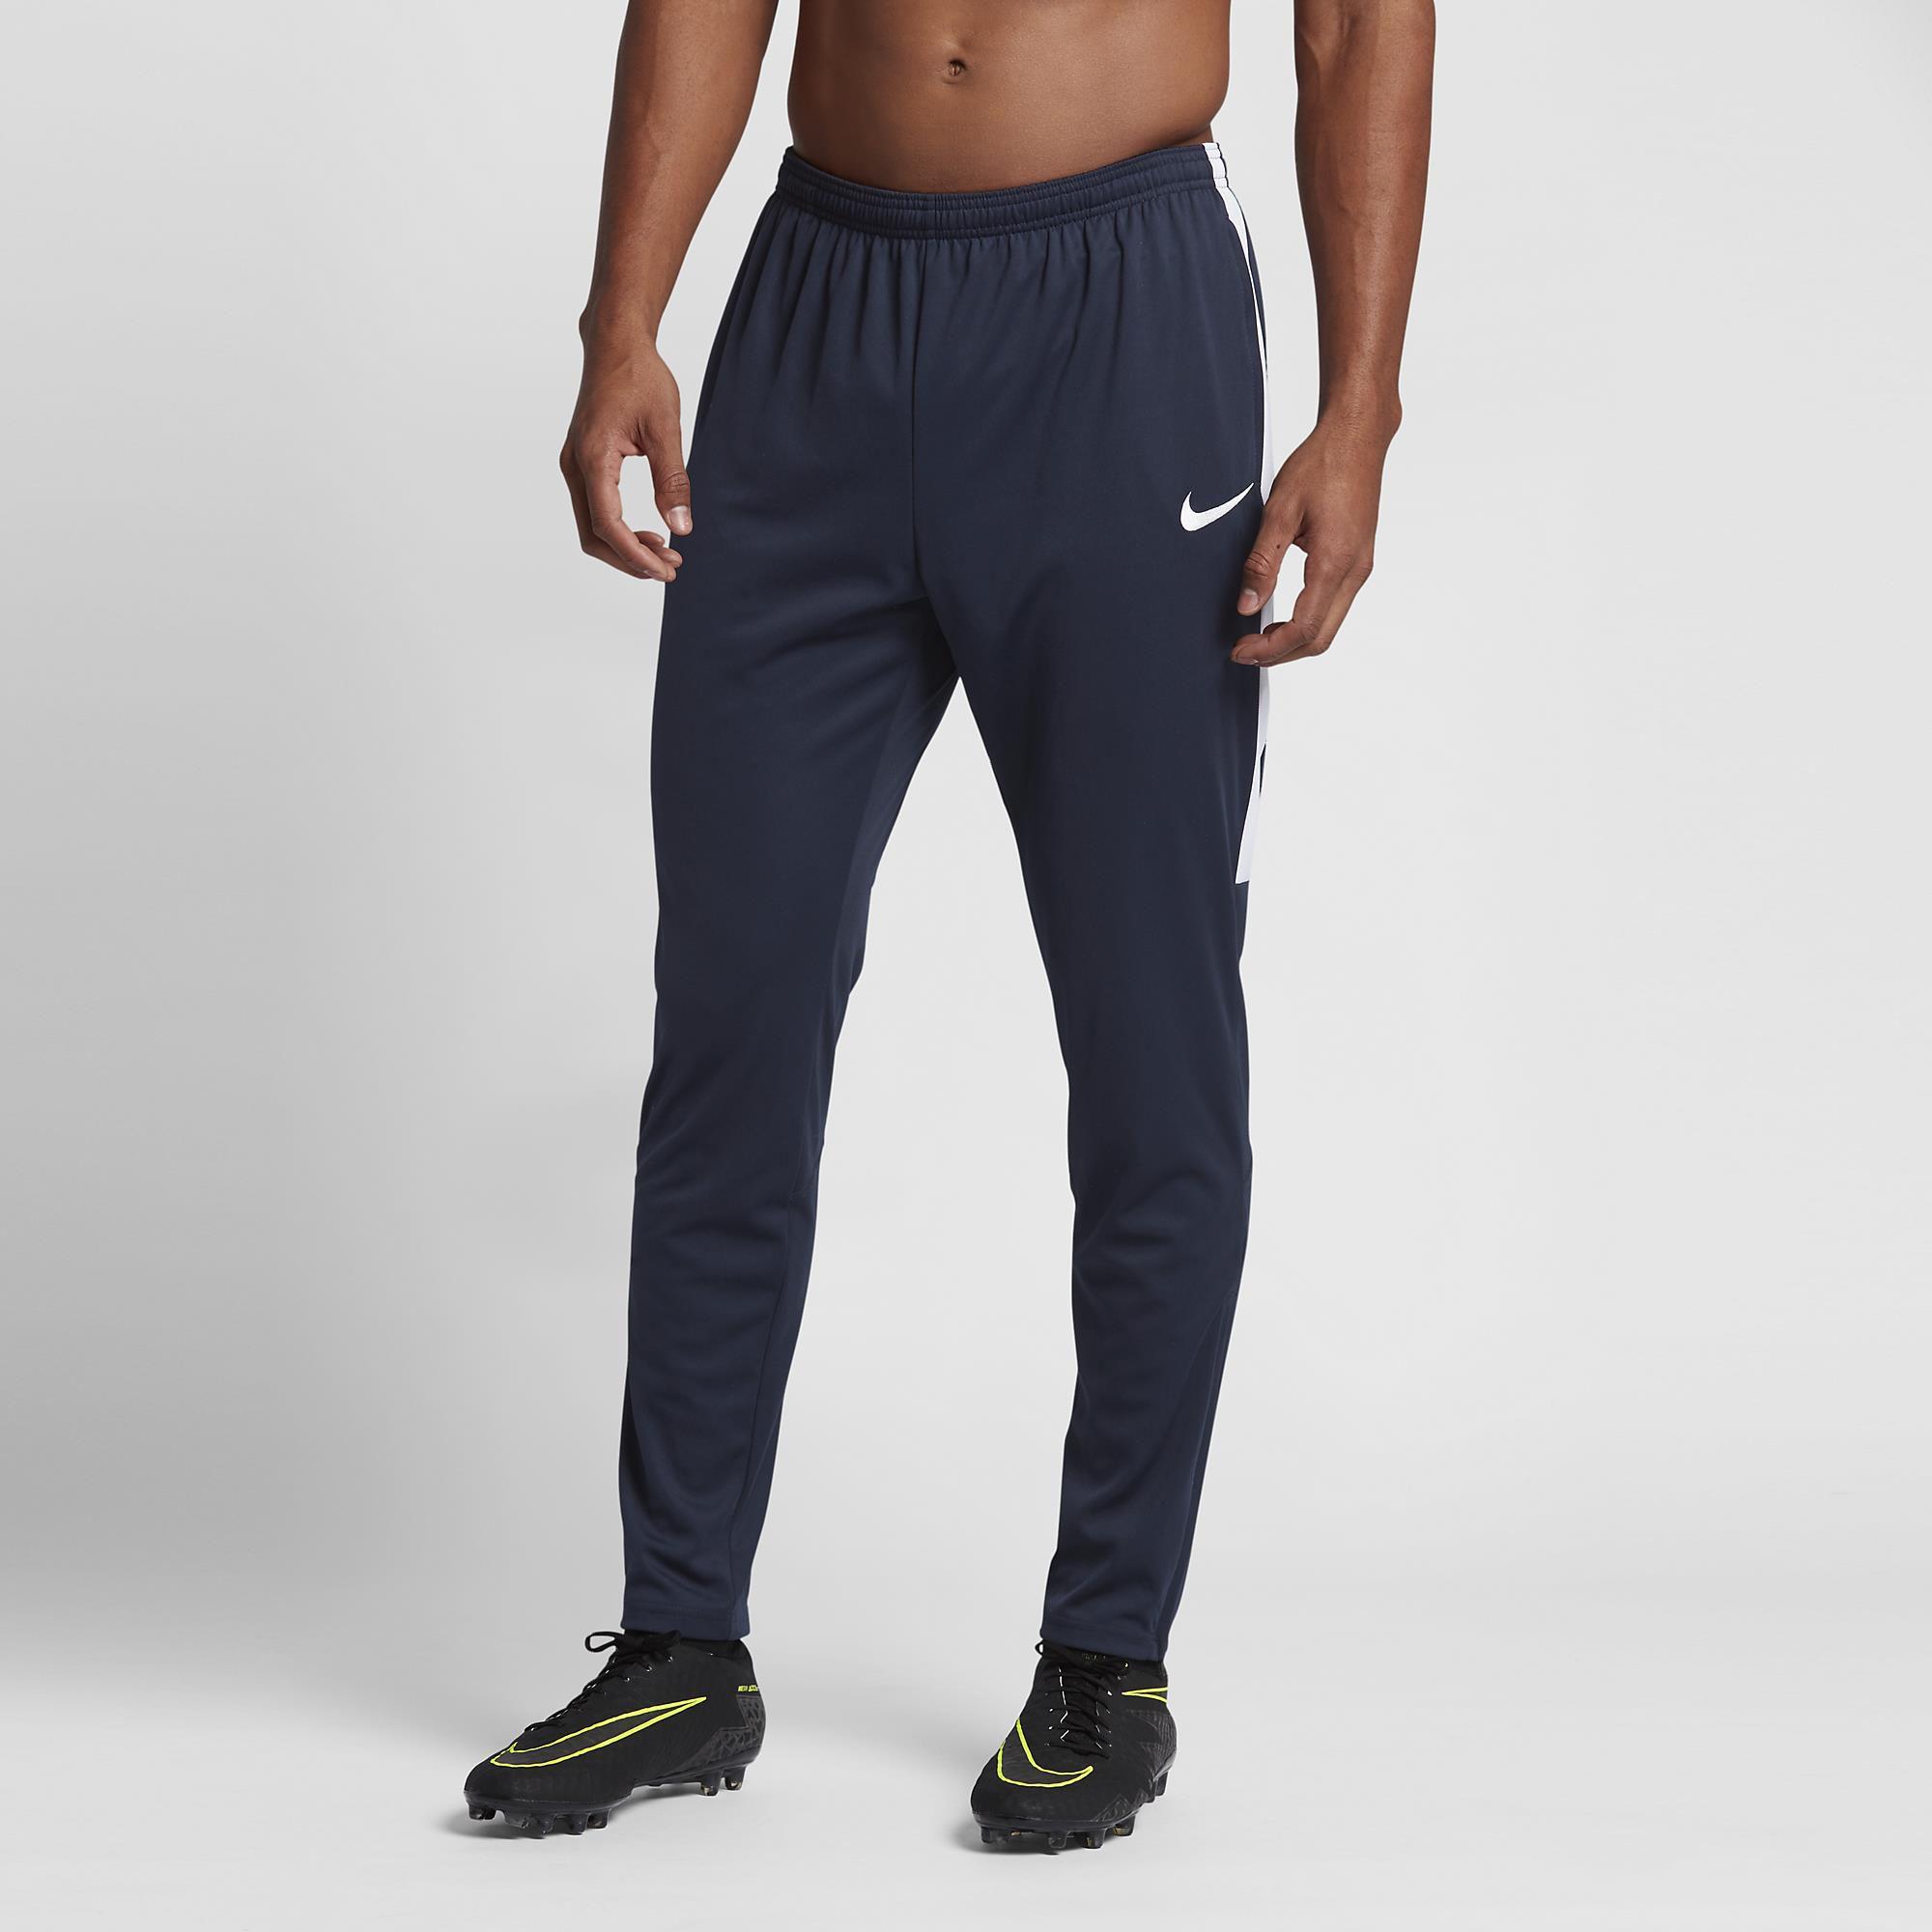 Calça Nike Dry Pant Academy - Azul